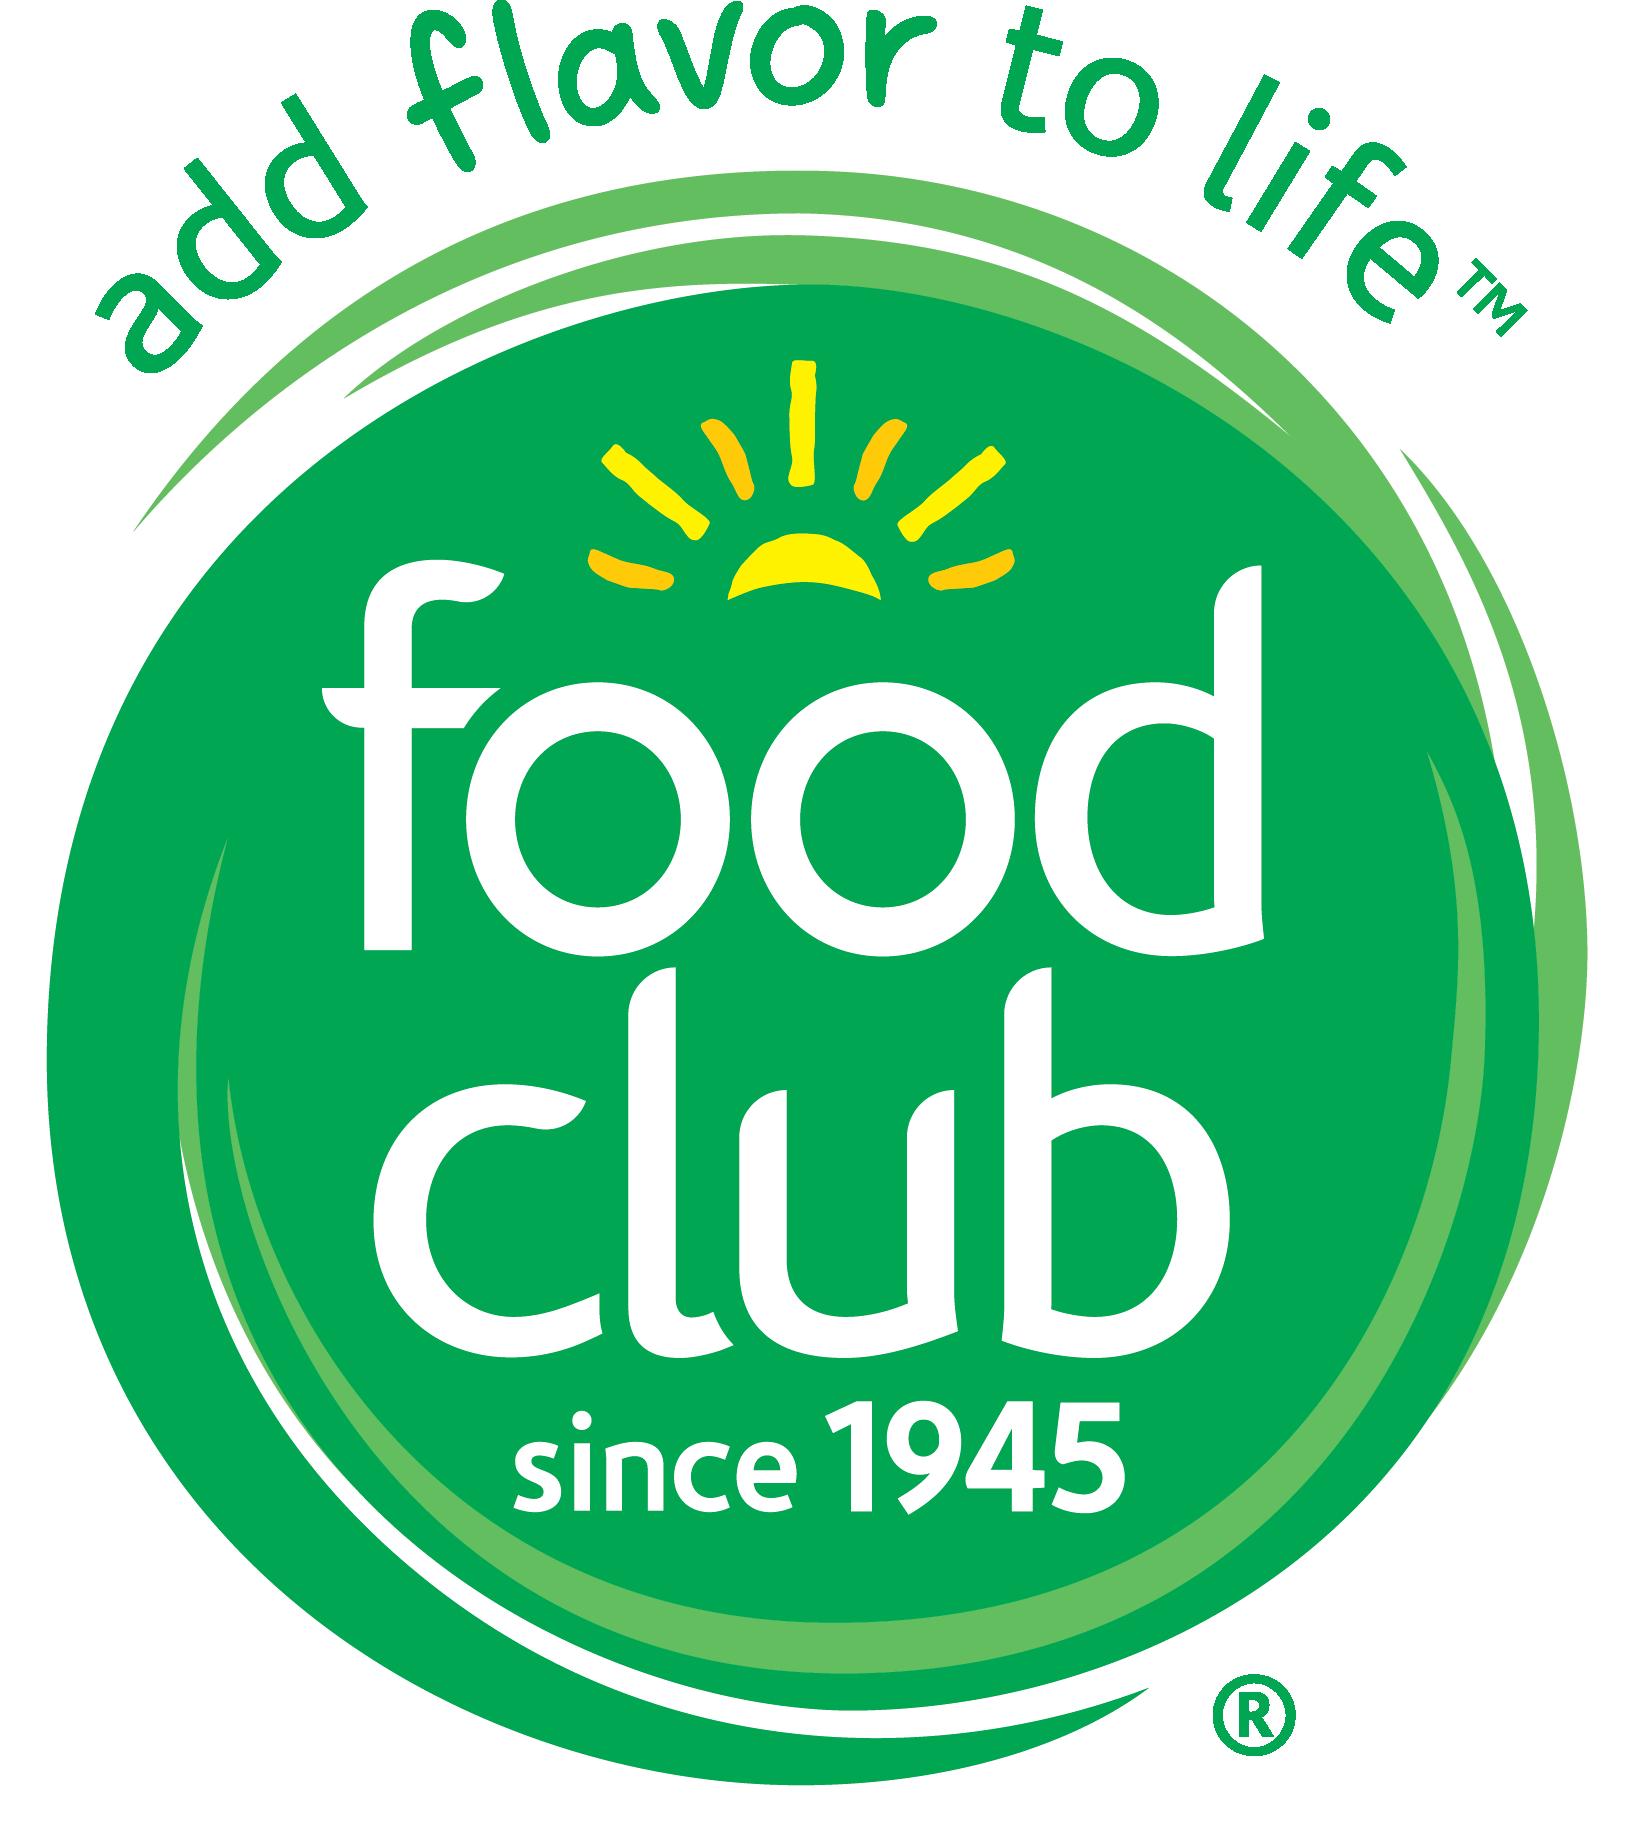 FoodClub_2015_Logo.png